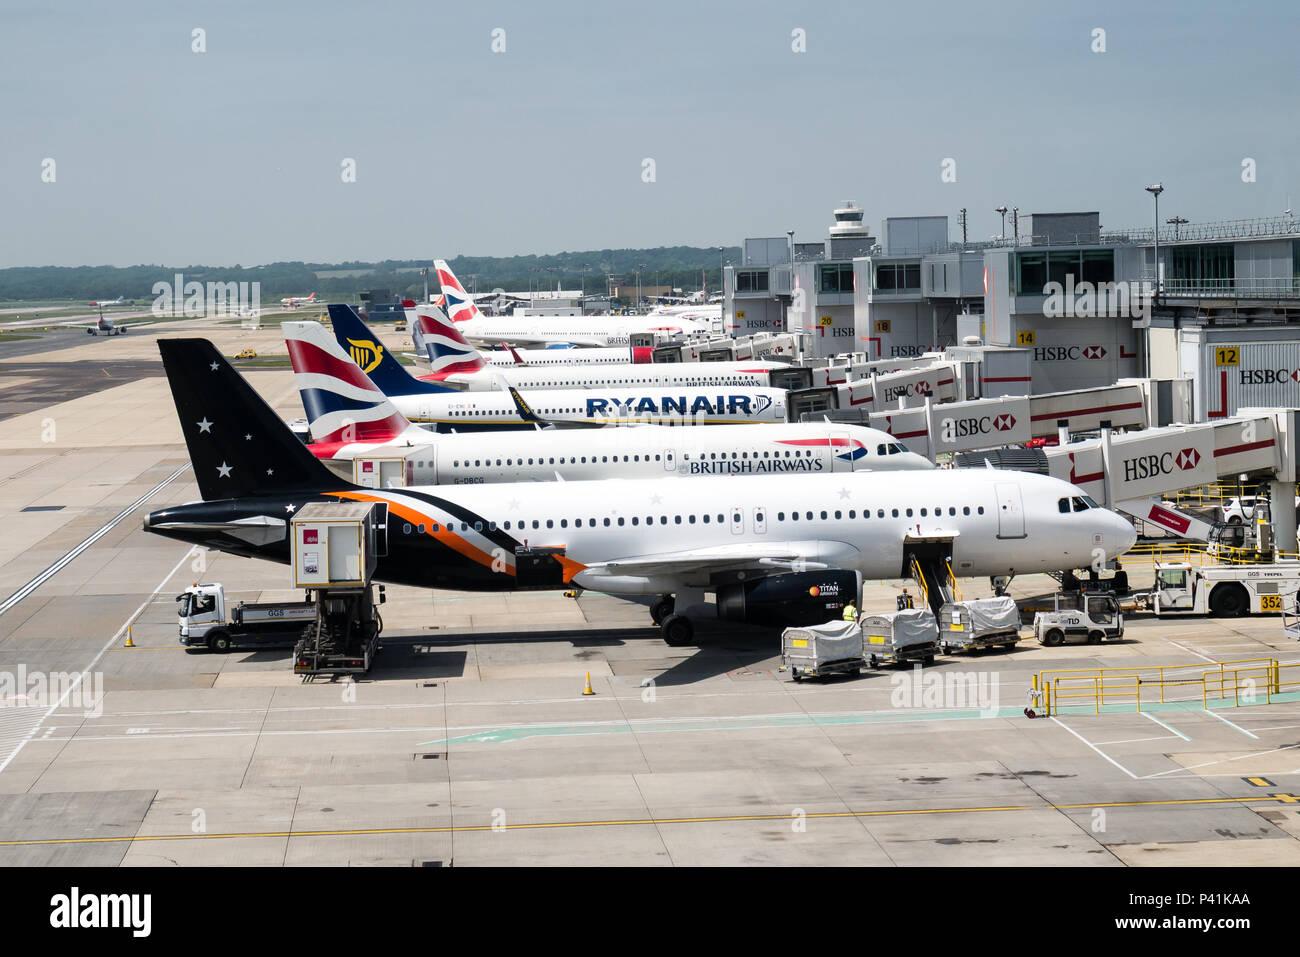 Aircraft at Gatwick Airport - Stock Image